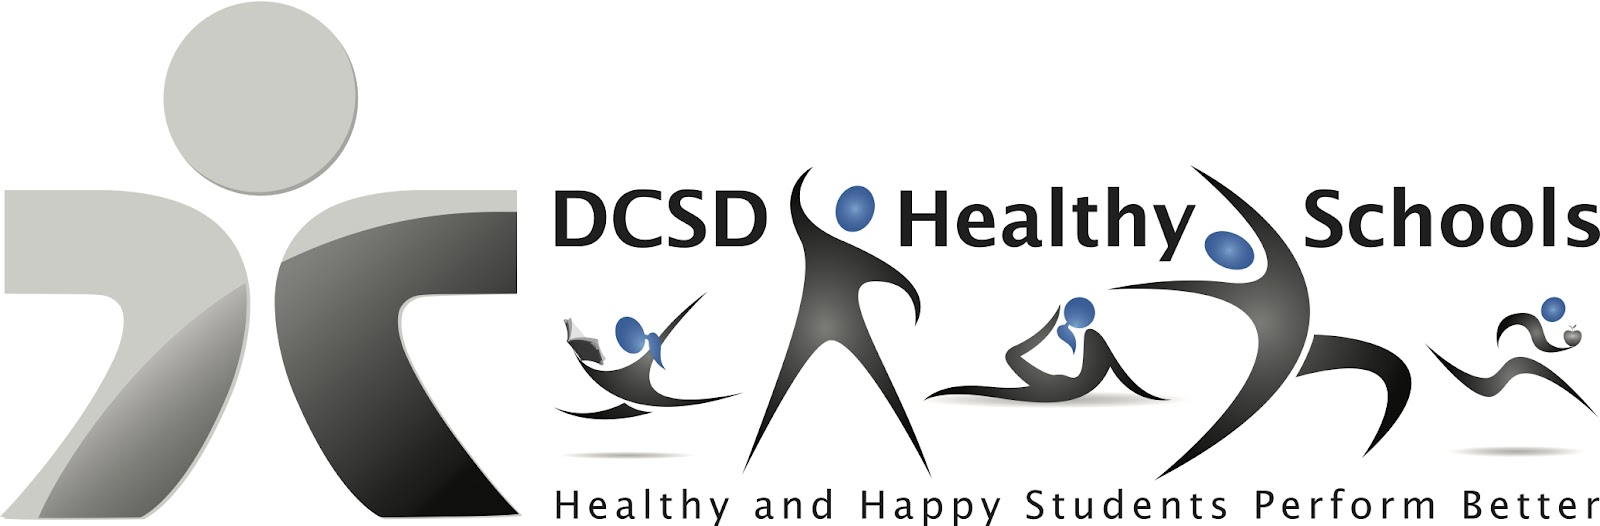 DCSDHealthySchoolsLogo.jpg